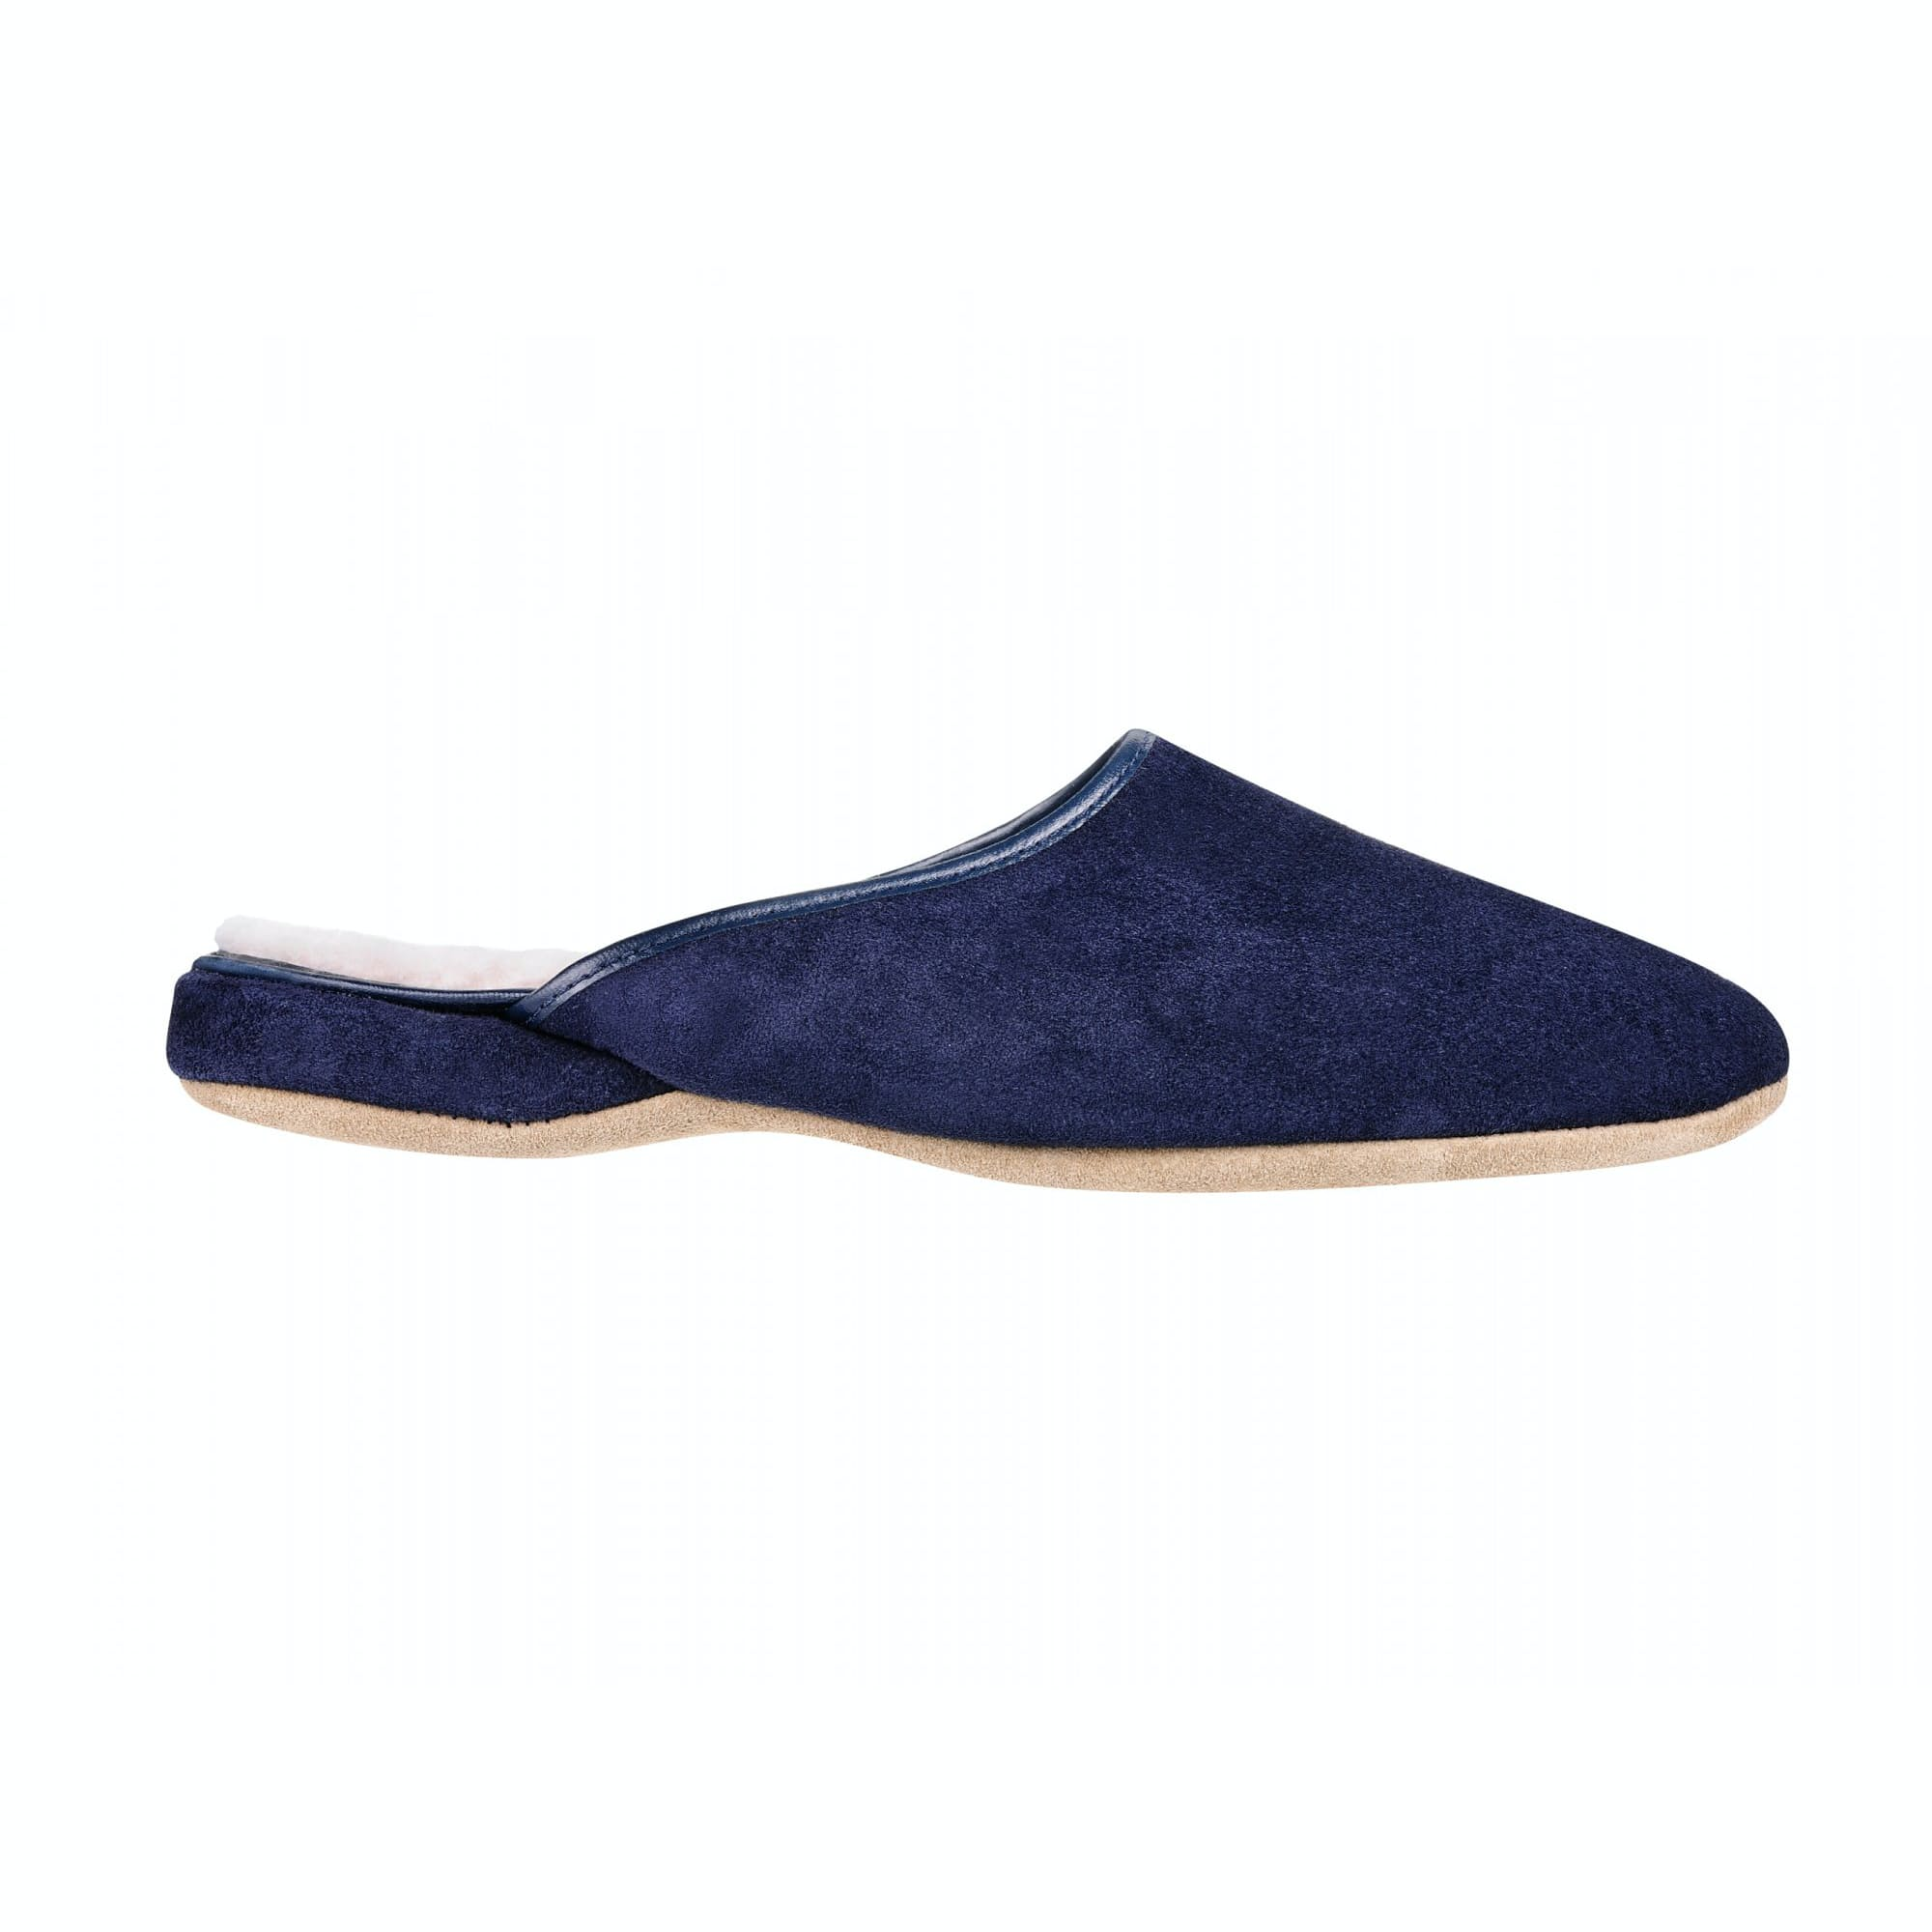 Pmvkedshp4 derek rose shearling lined suede douglas slipper 0 original